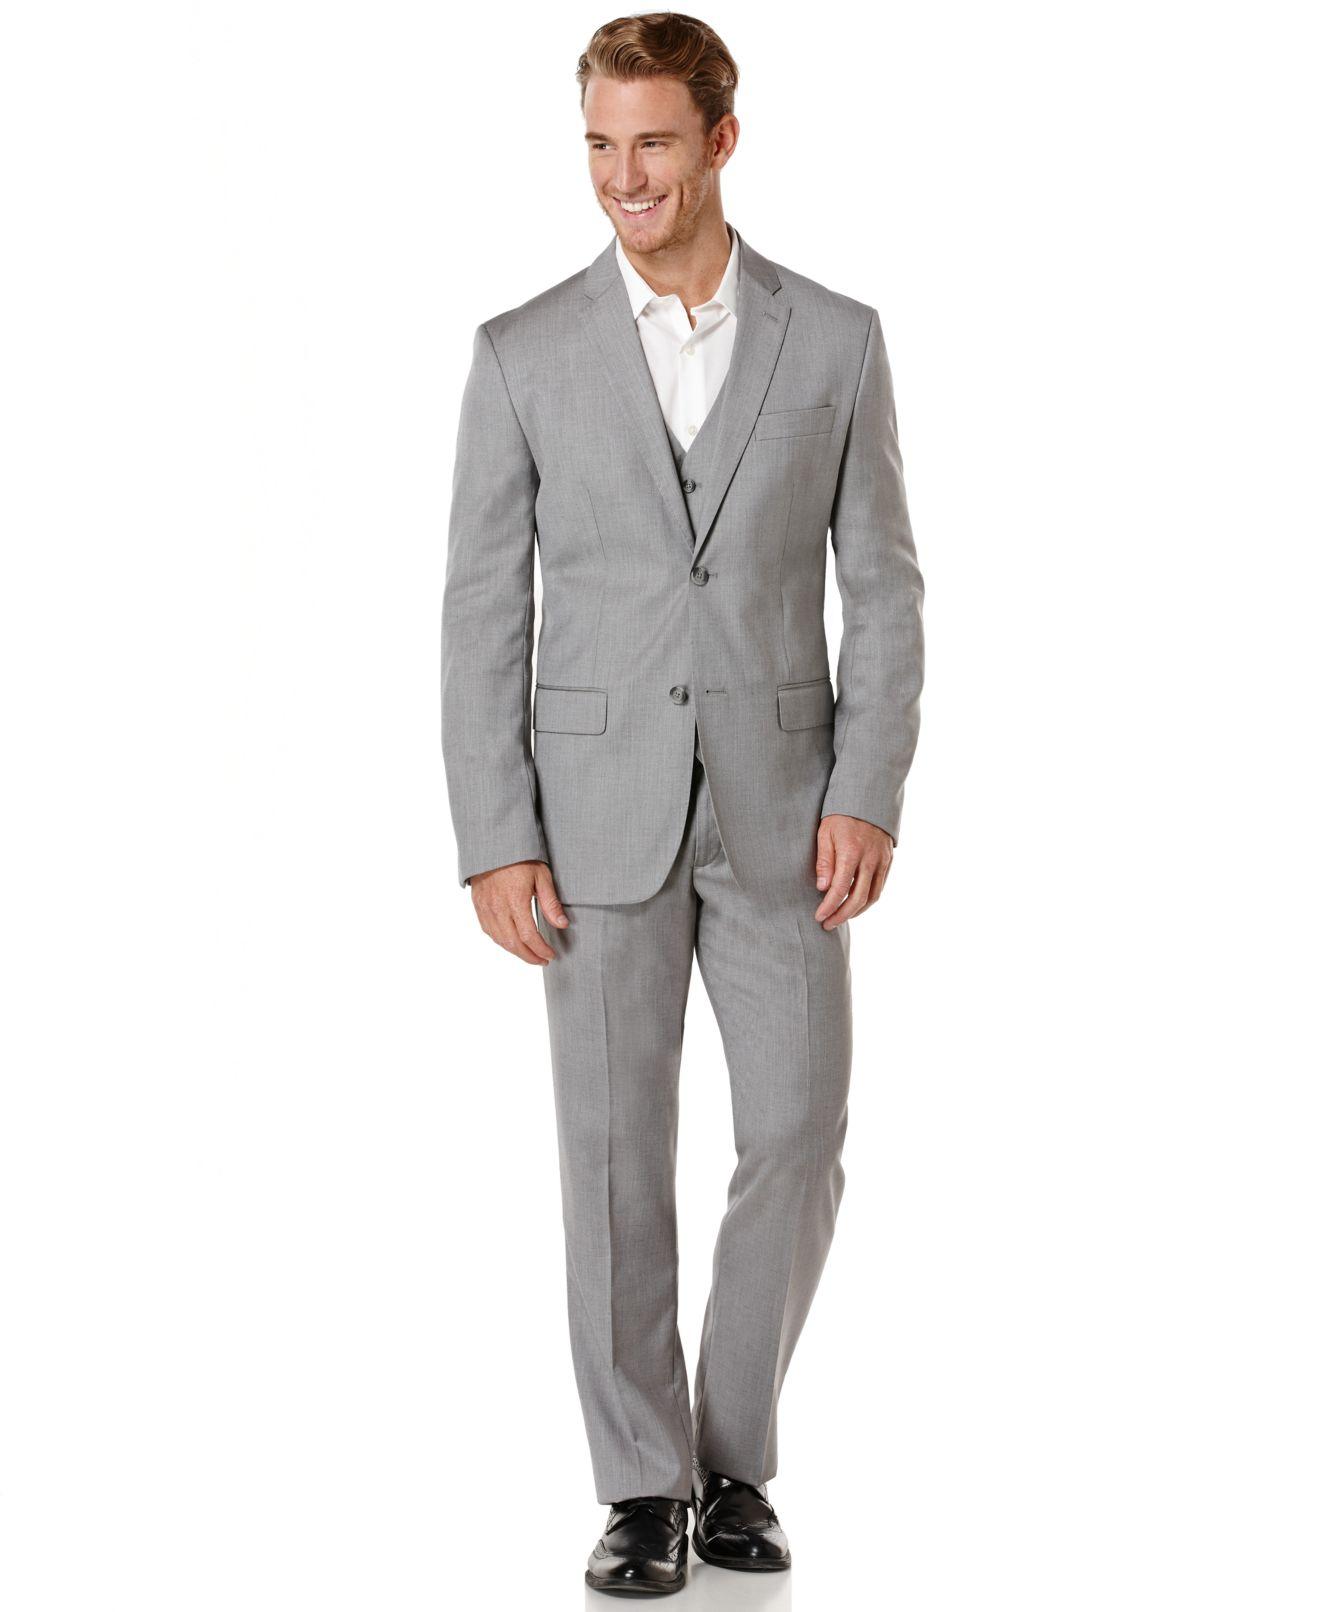 Perry Ellis Mens Clothing at Macy's - Mens Apparel - Macy's